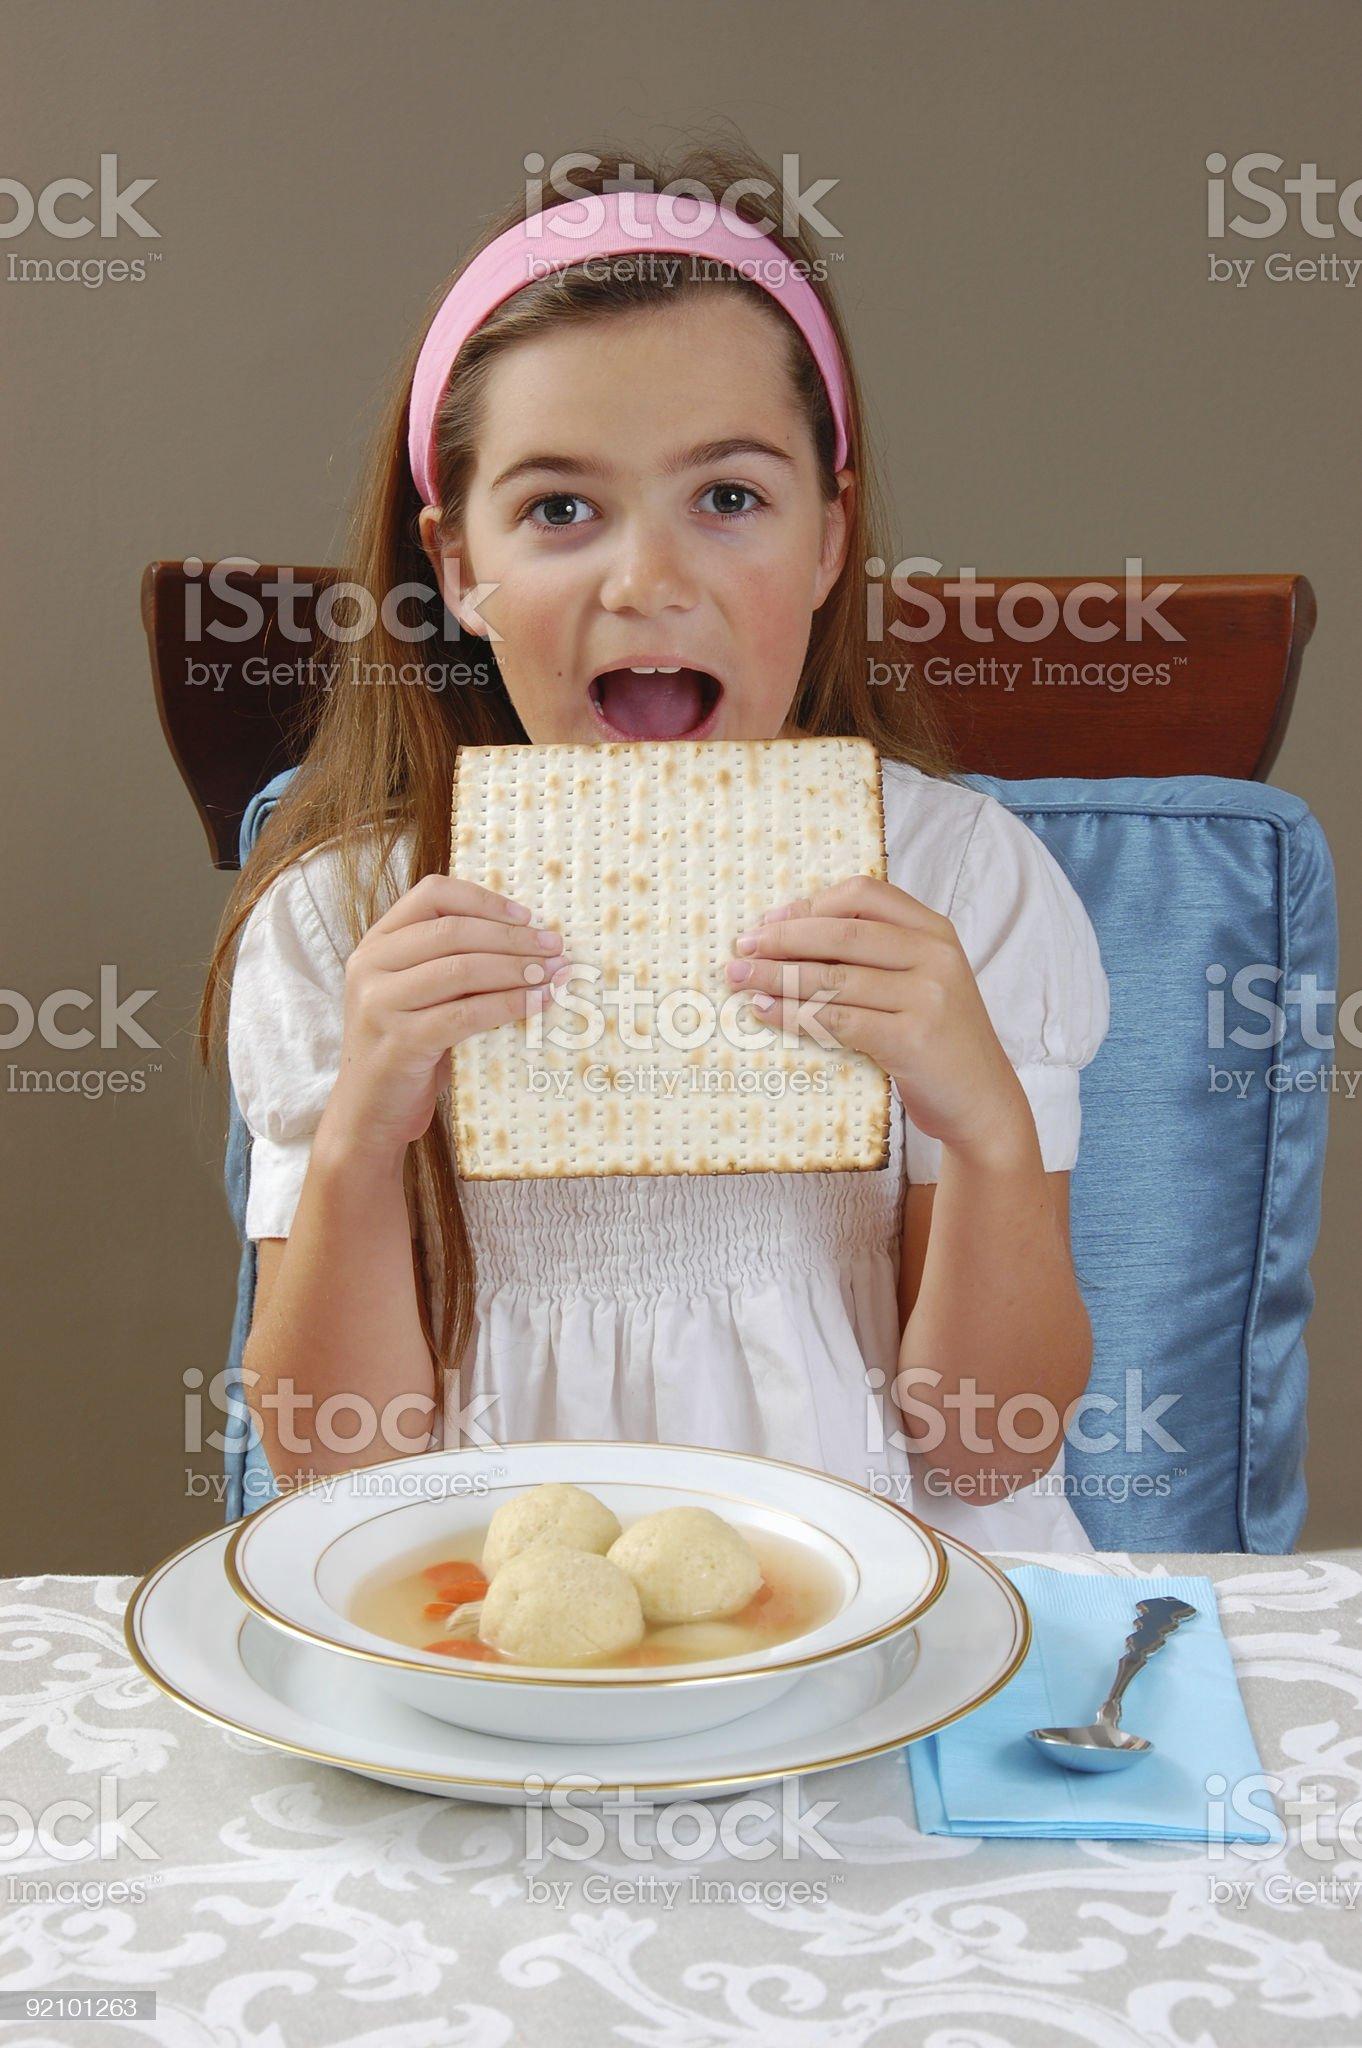 Eating Matzah royalty-free stock photo